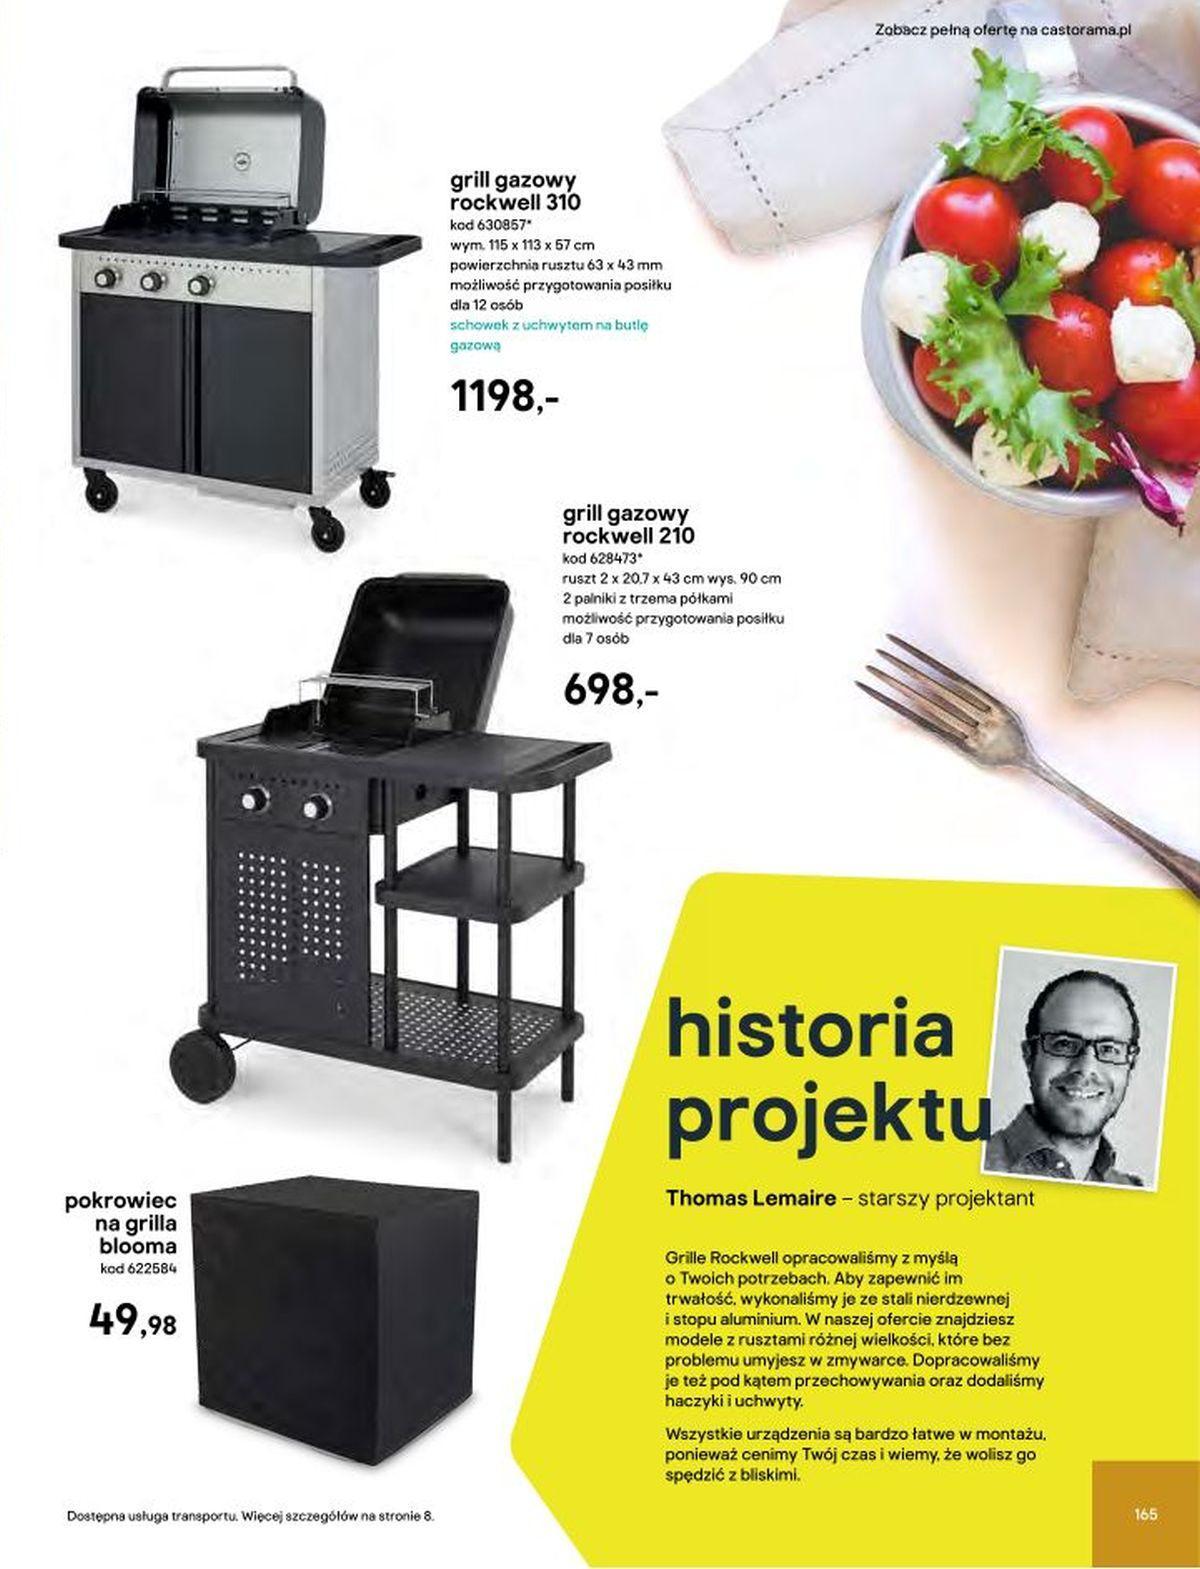 Gazetka promocyjna Castorama do 31/12/2019 str.158